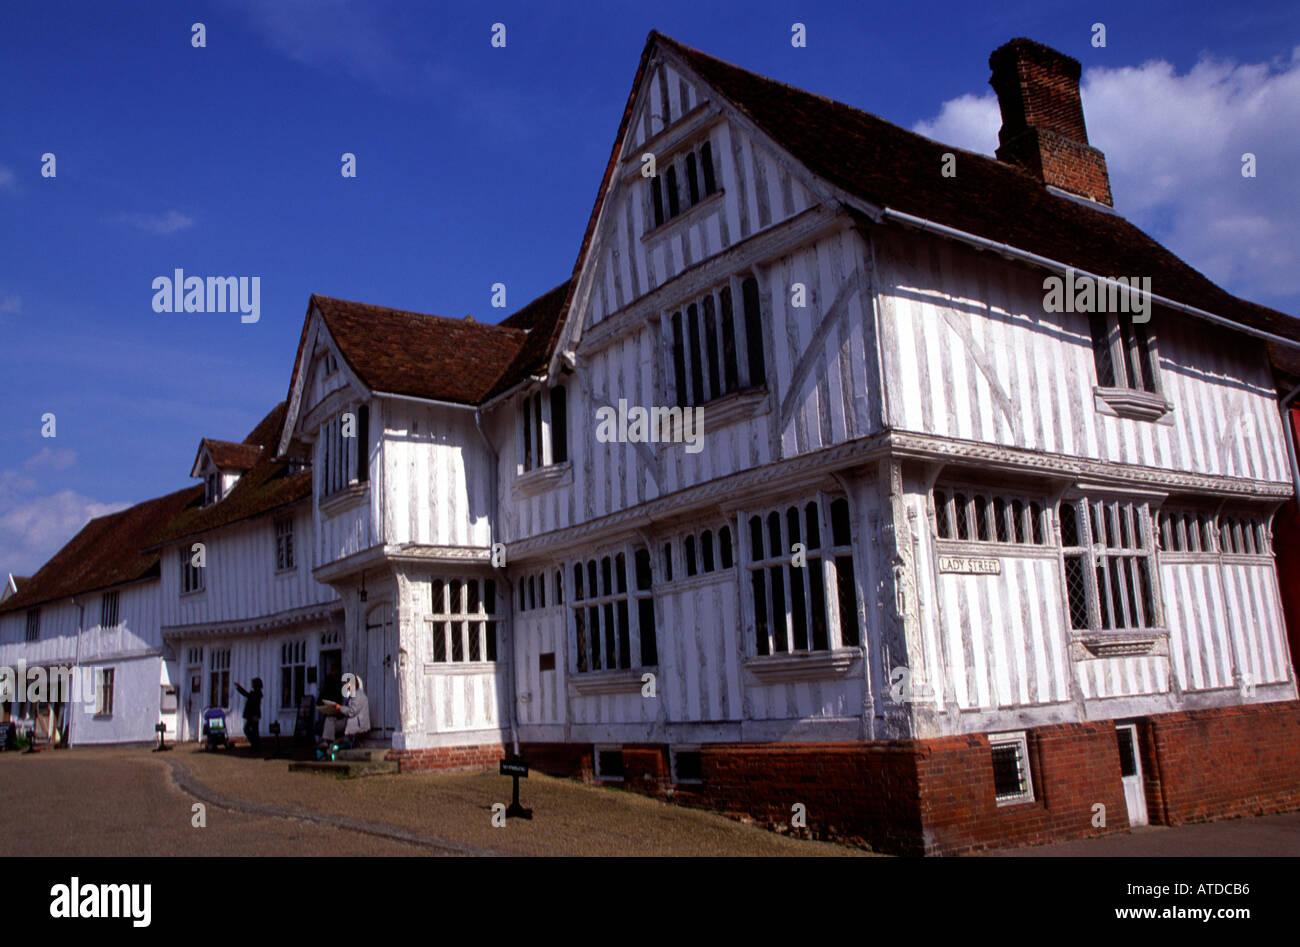 Lady Street Guildhall Lavenham Suffolk - Stock Image